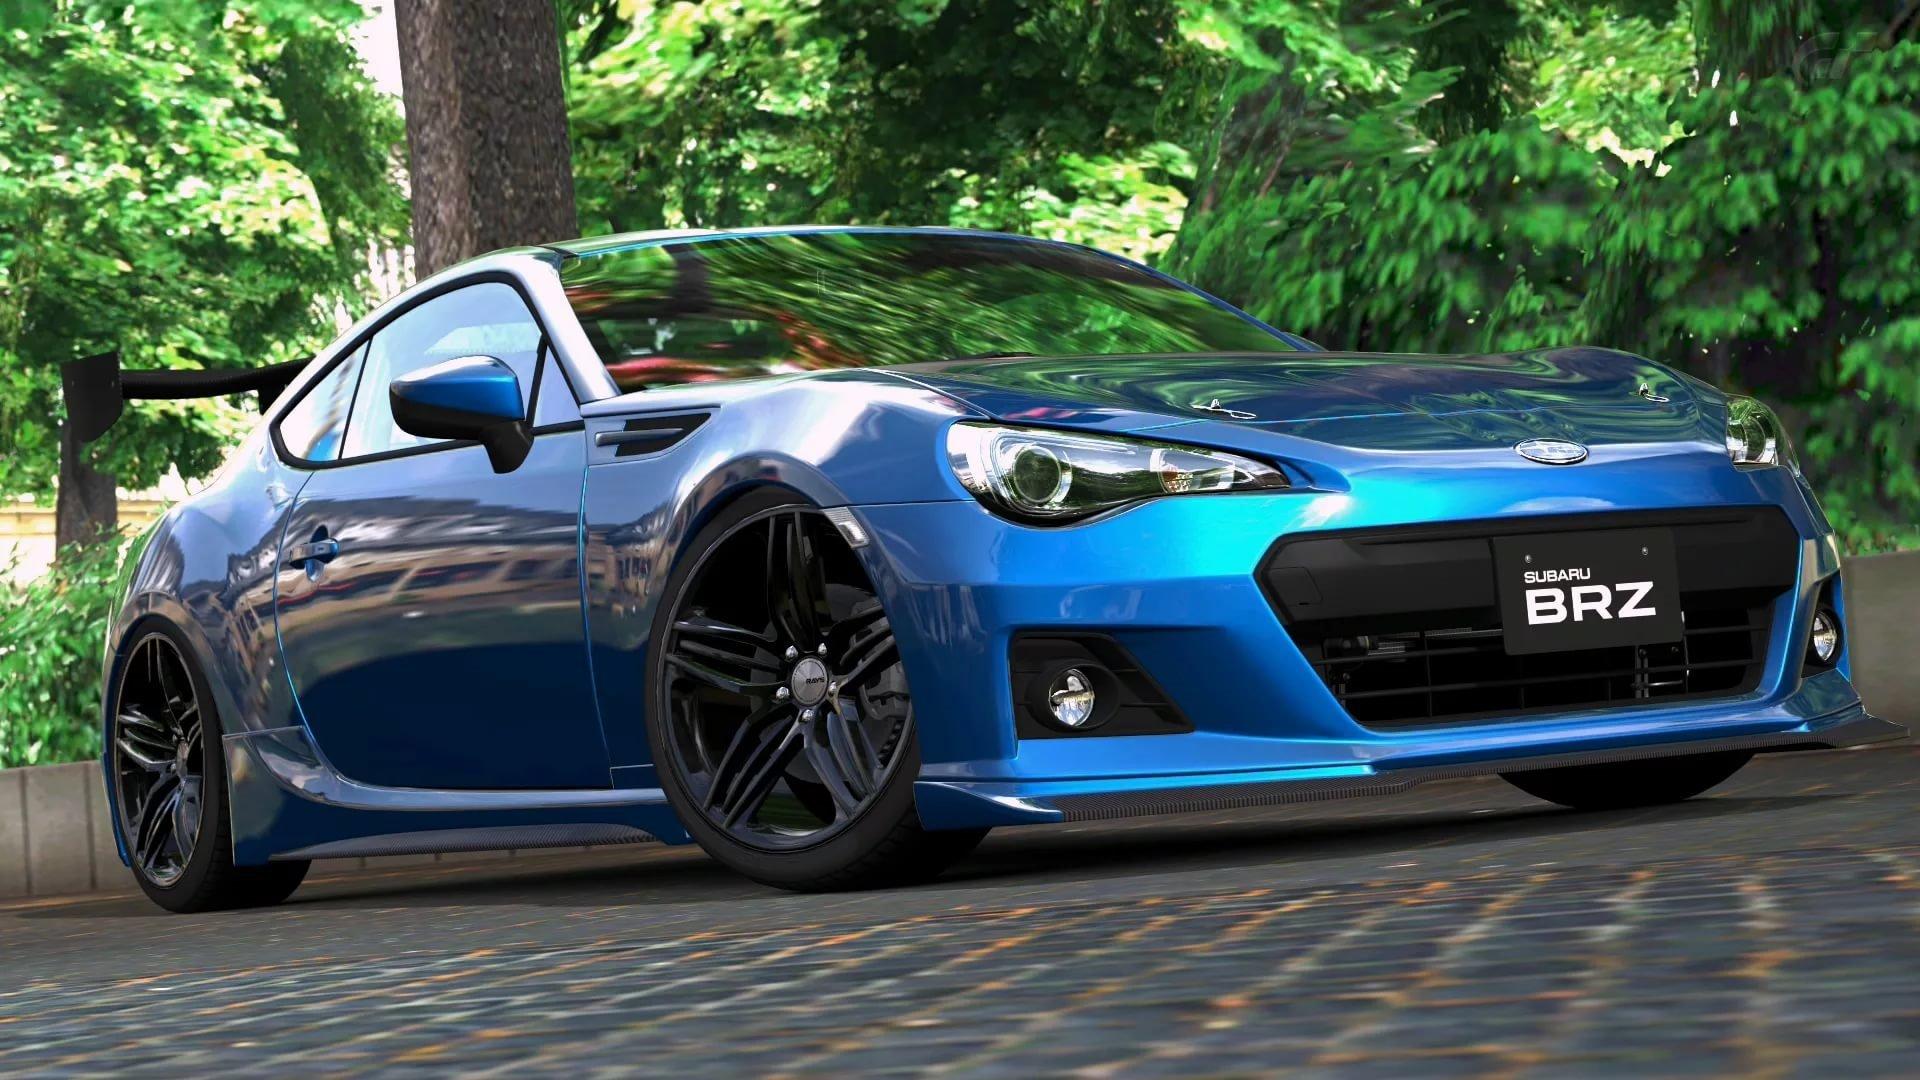 Subaru BRZ Wallpaper Image